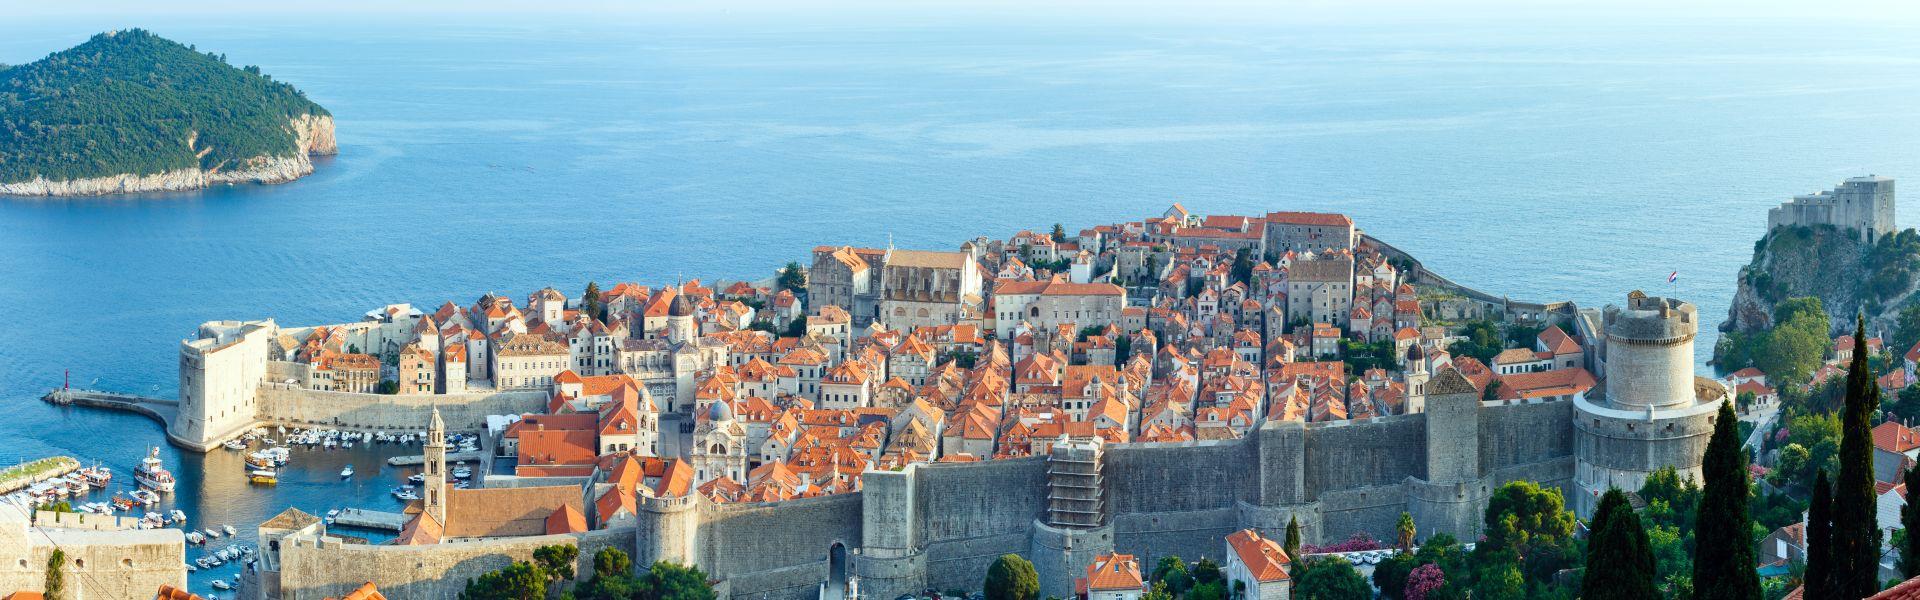 Dubrovnik Old Town Panorama (Croatia)